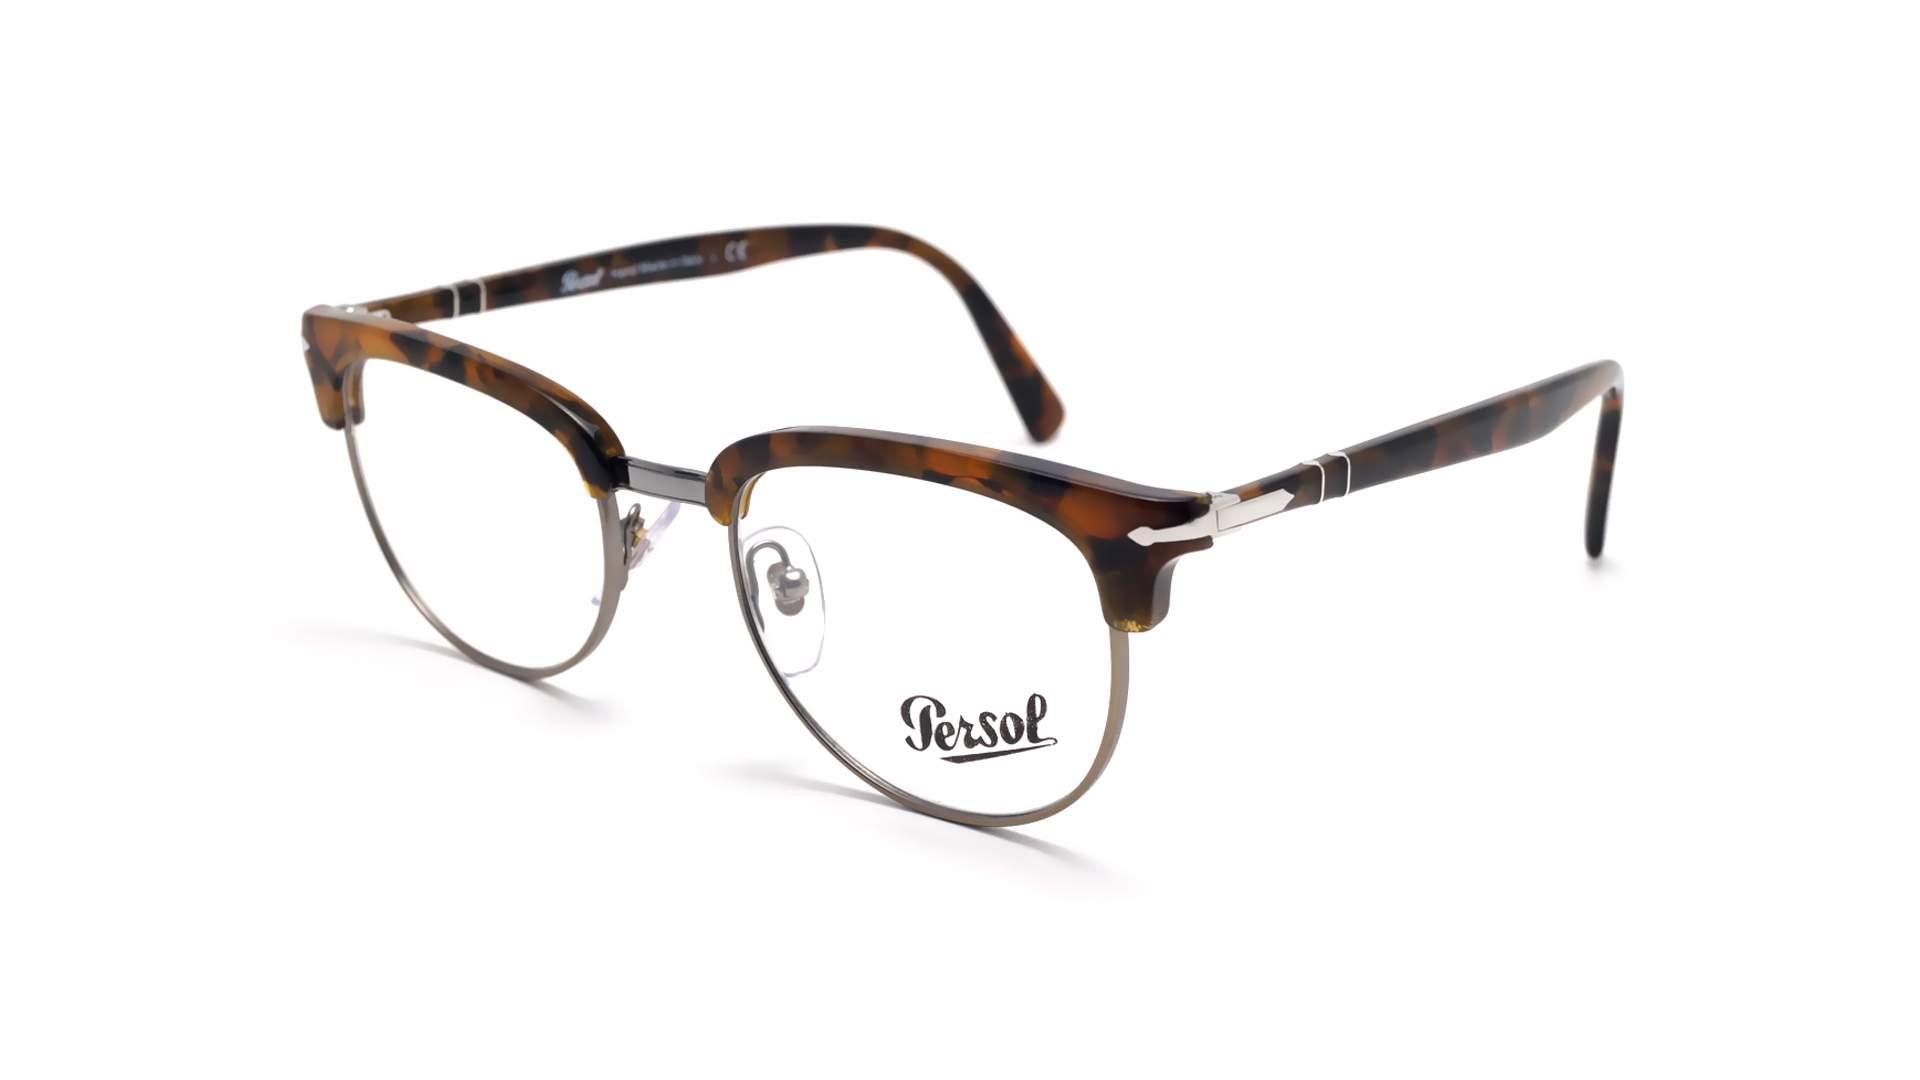 abc42ecd56 Eyeglasses Persol Tailoring edition Tortoise PO3197V 1073 50-20 Medium